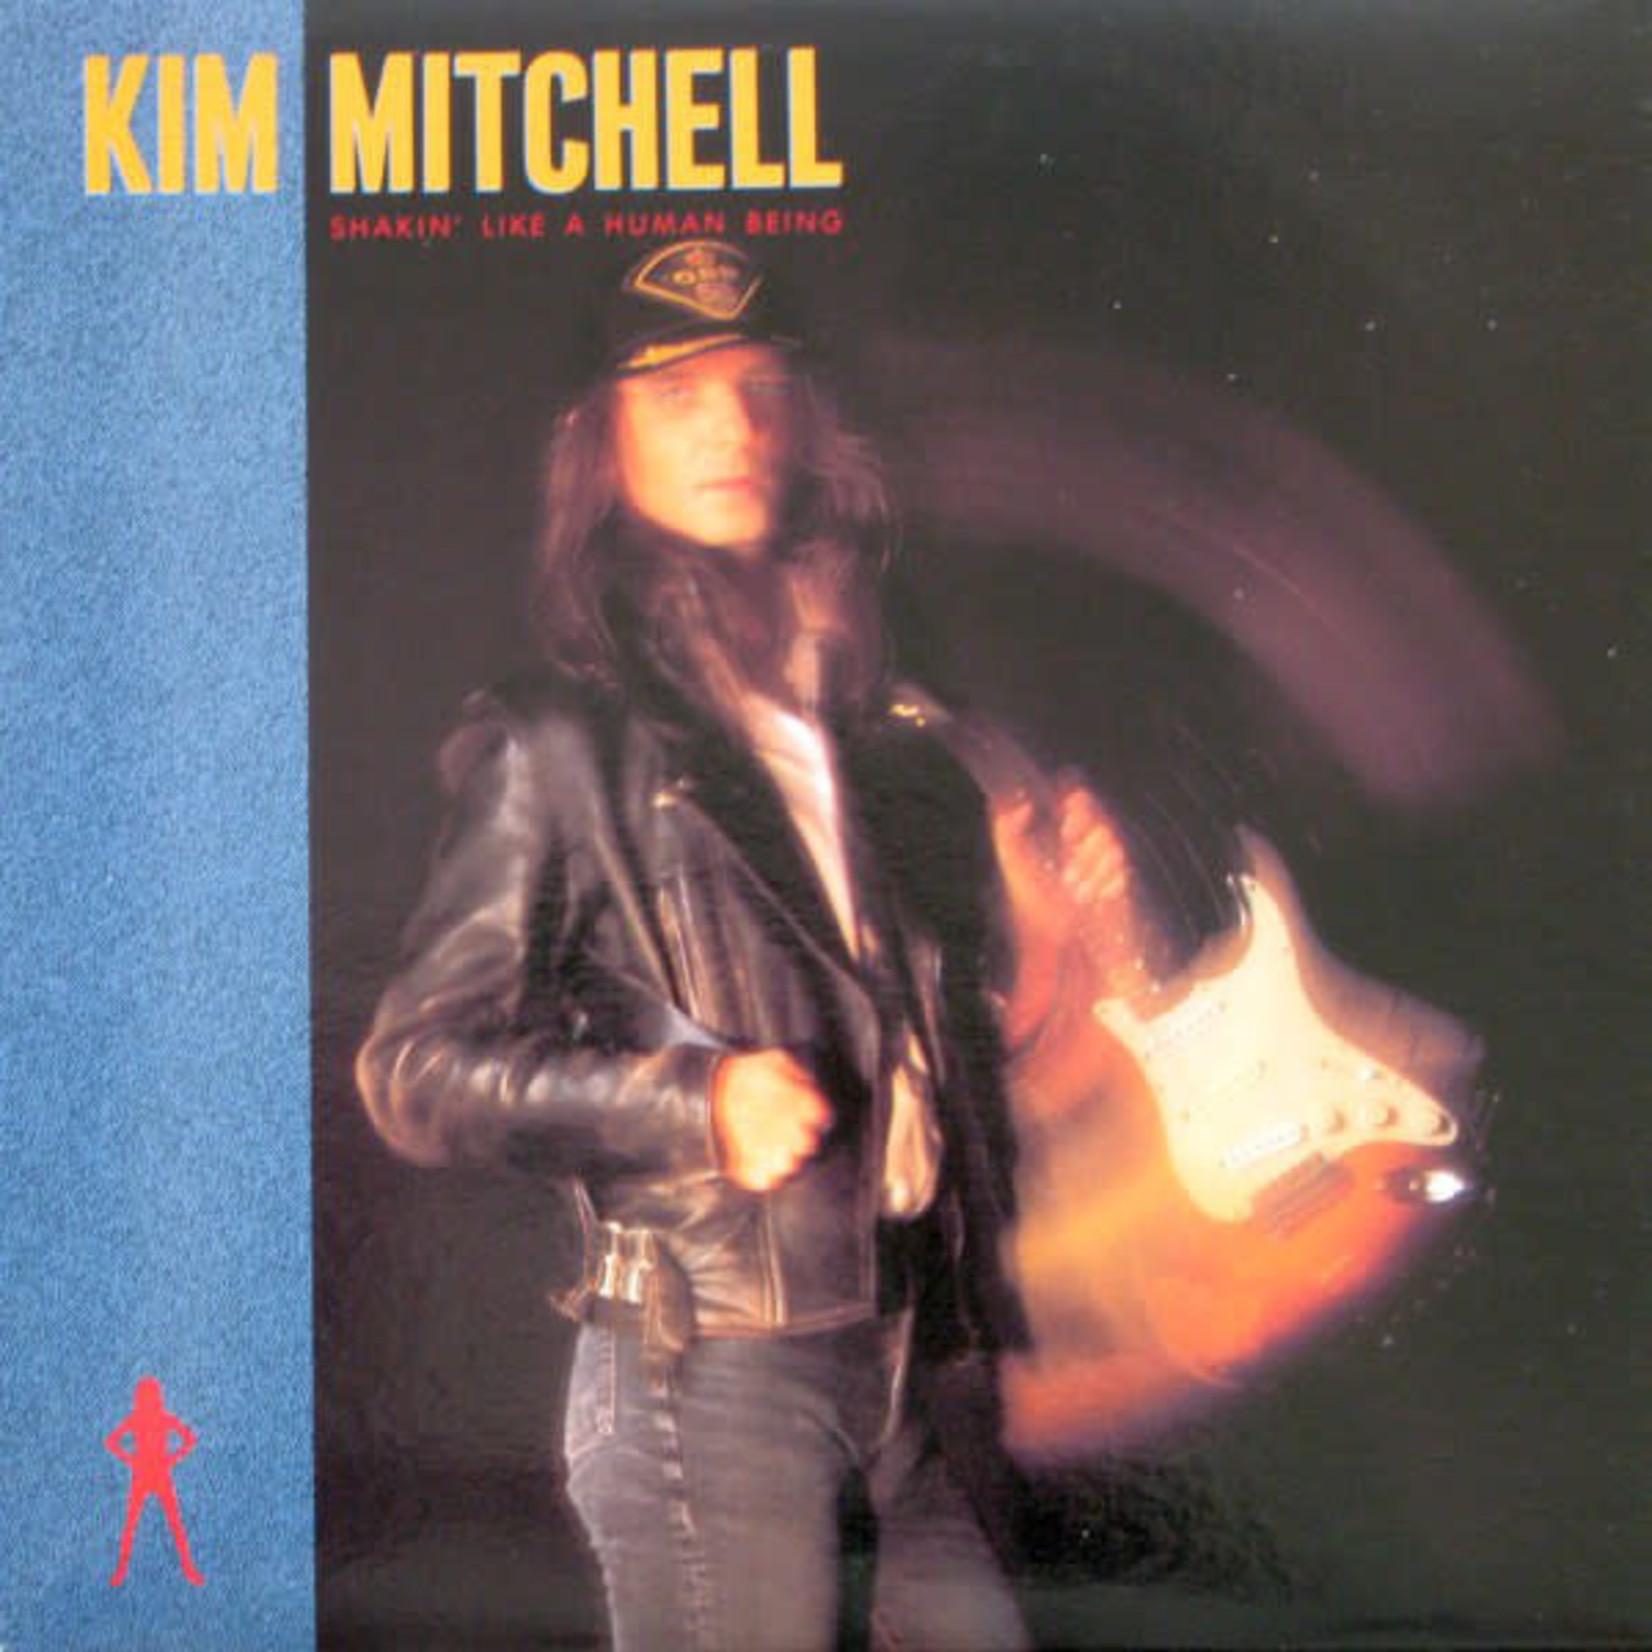 [Vintage] Mitchell, Kim: Shakin' Like a Human Being